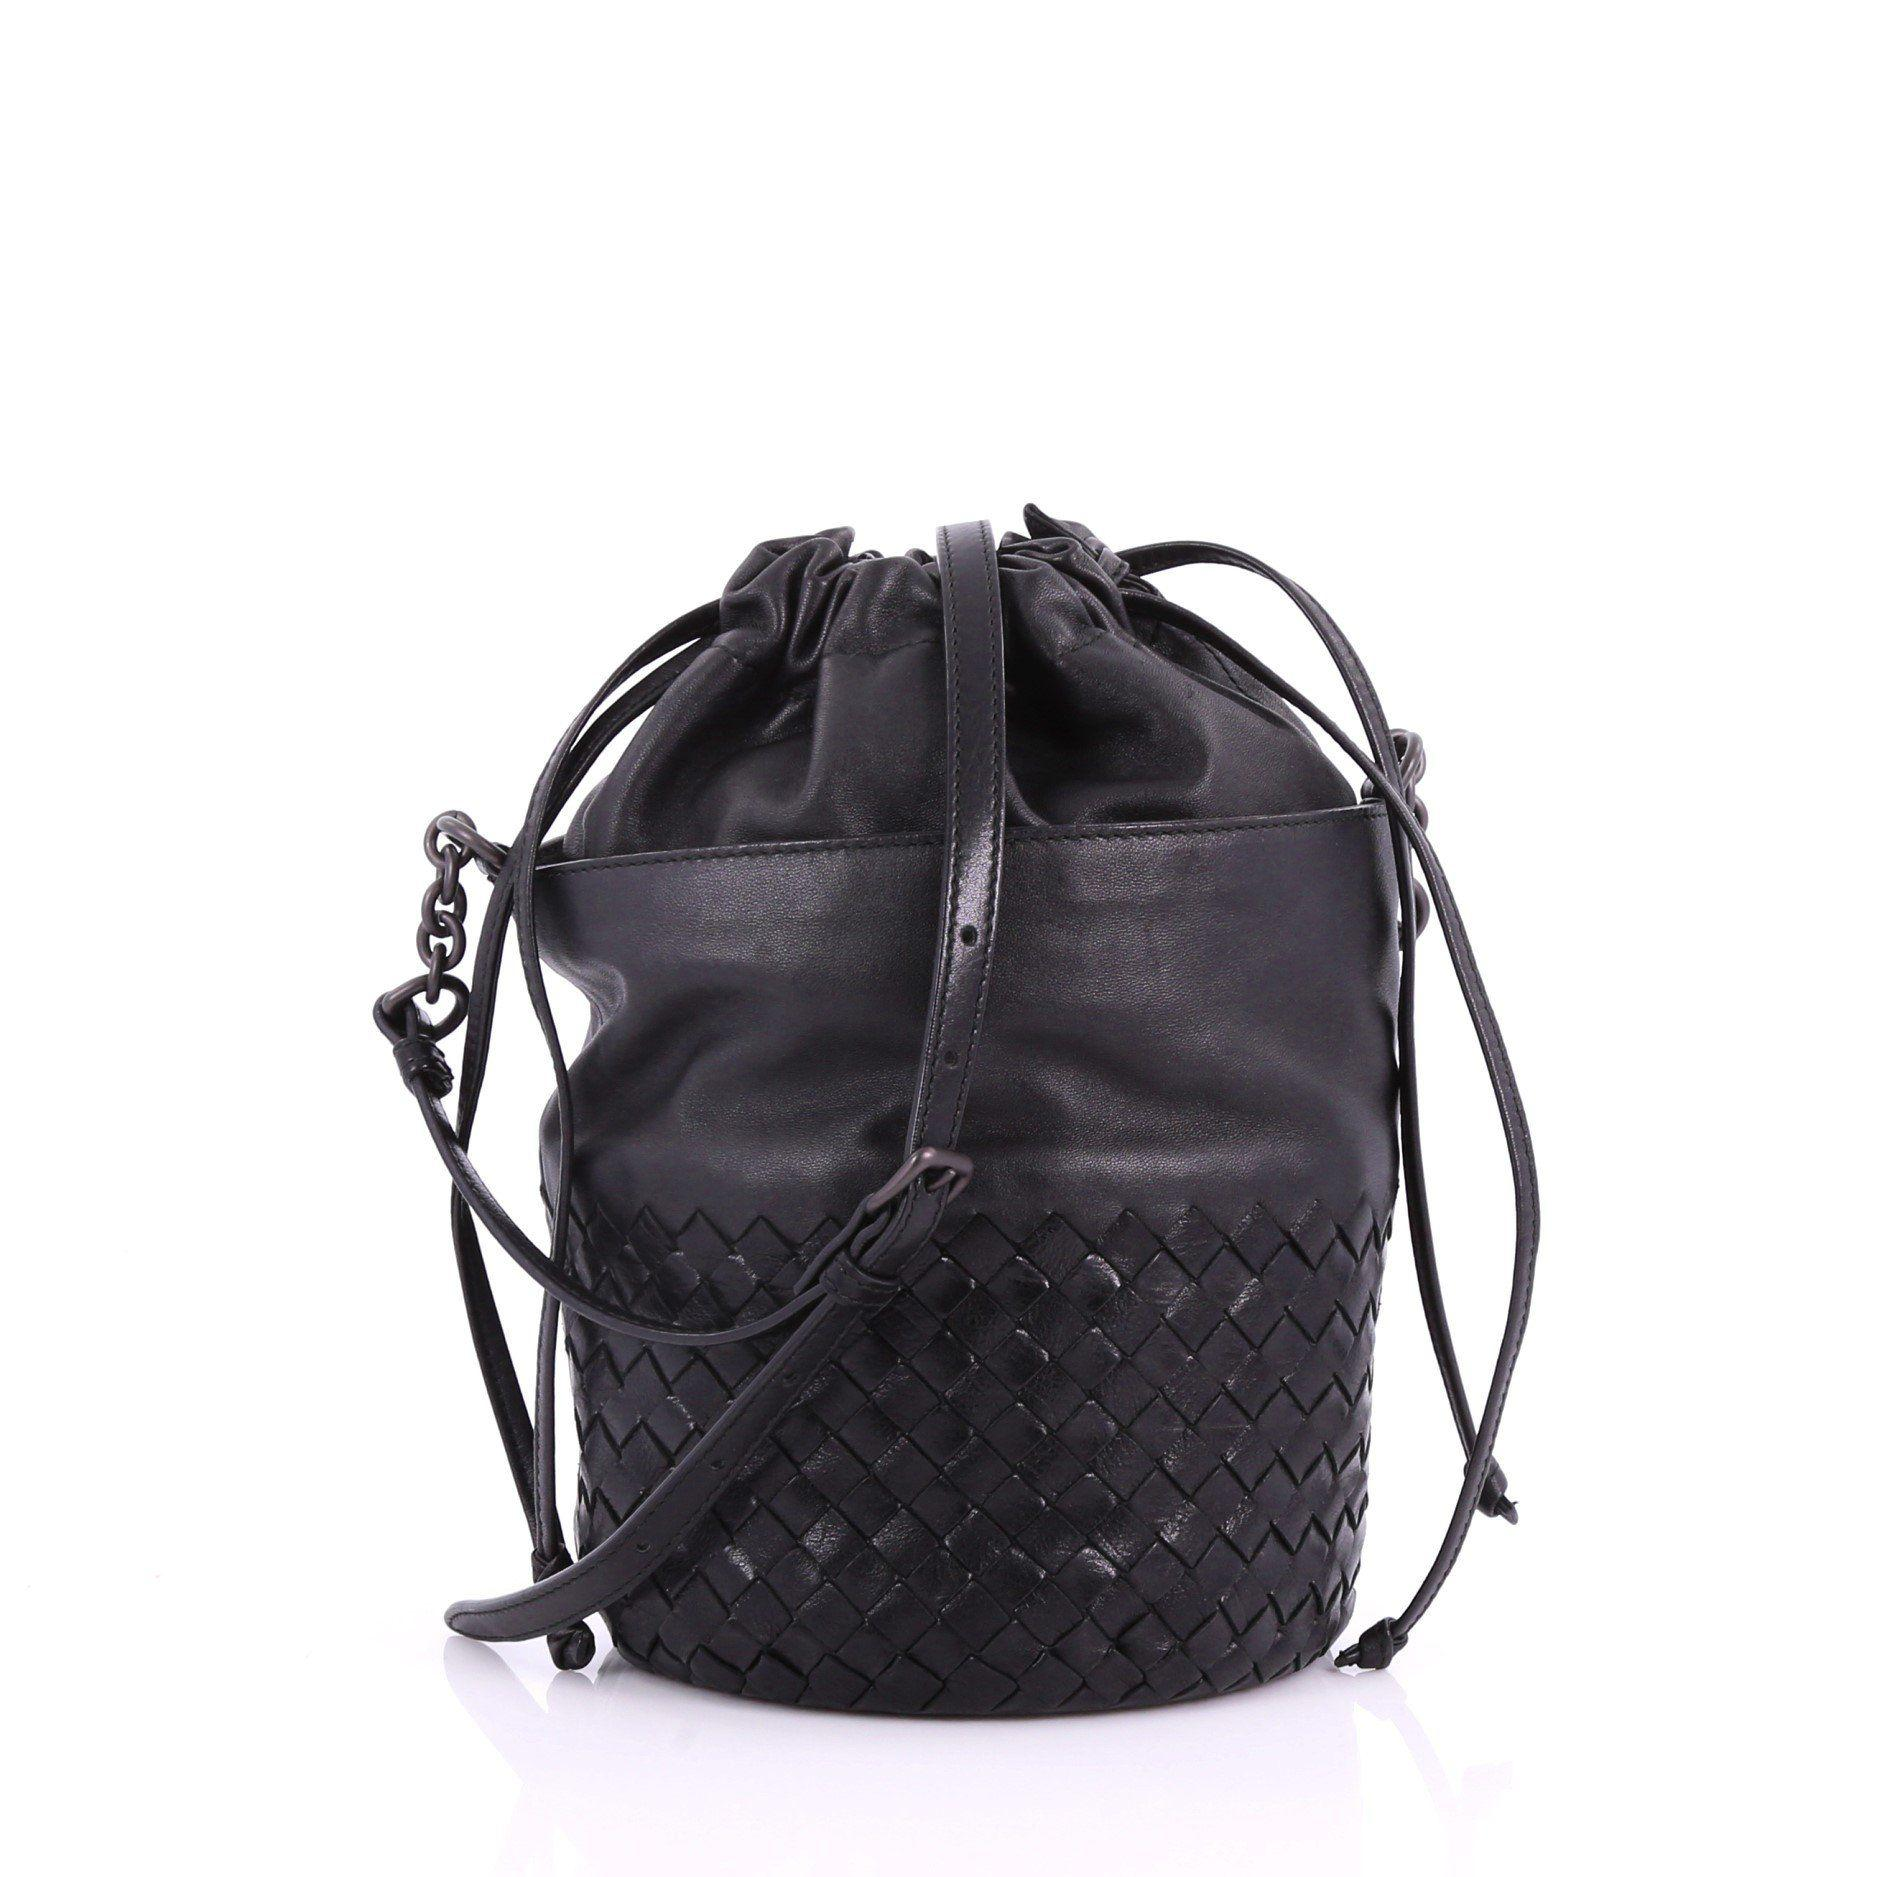 cc06bc2970b2 Bottega Veneta. Women s Black Pre Owned Drawstring Bucket Bag Leather ...